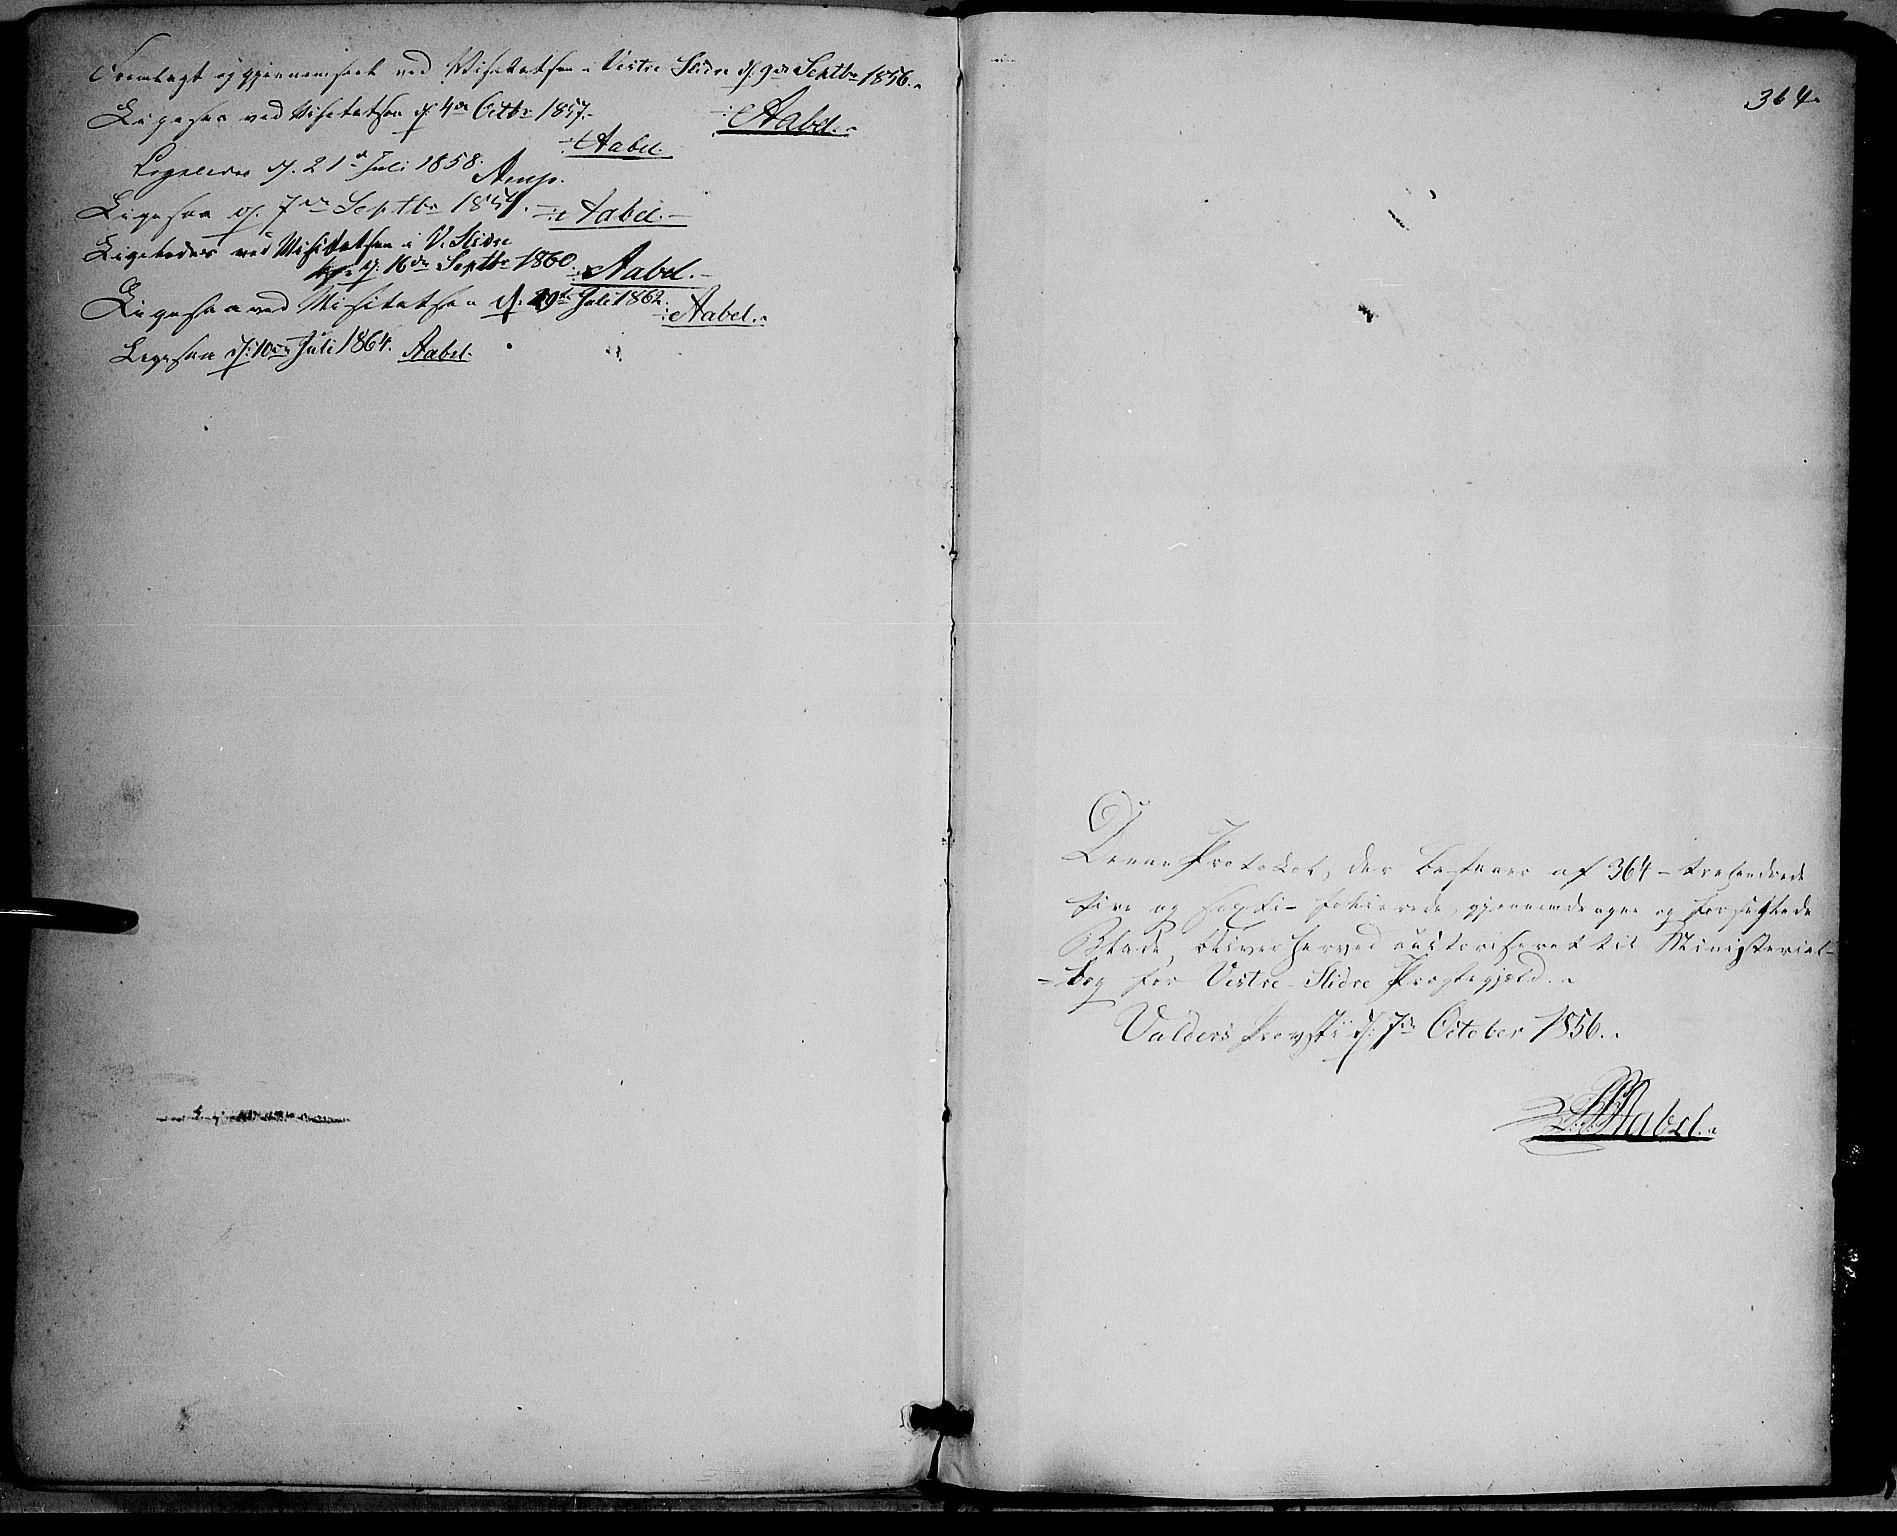 SAH, Vestre Slidre prestekontor, Ministerialbok nr. 2, 1856-1864, s. 364